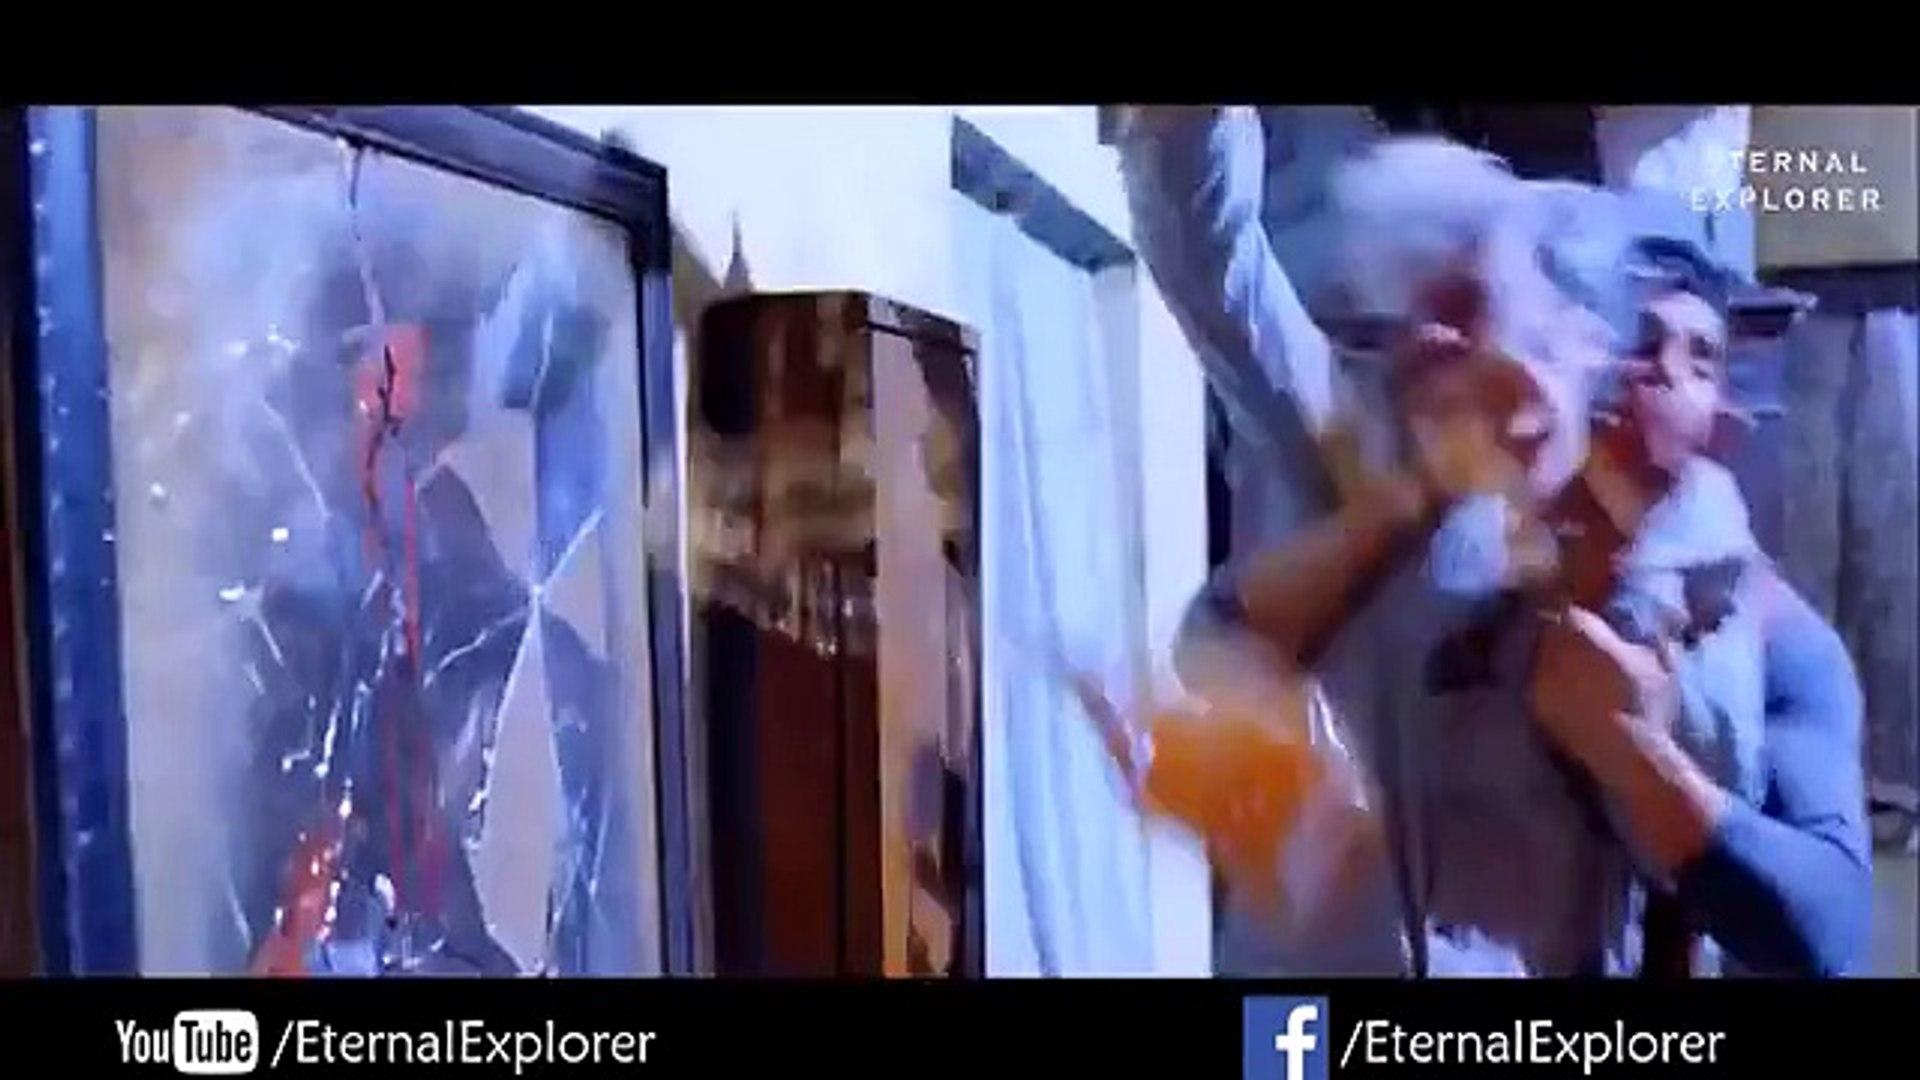 LIFE - Motivational Video (ft. Amitabh Bachchan) - Motivational video - Sandeep Maheshwari inspired